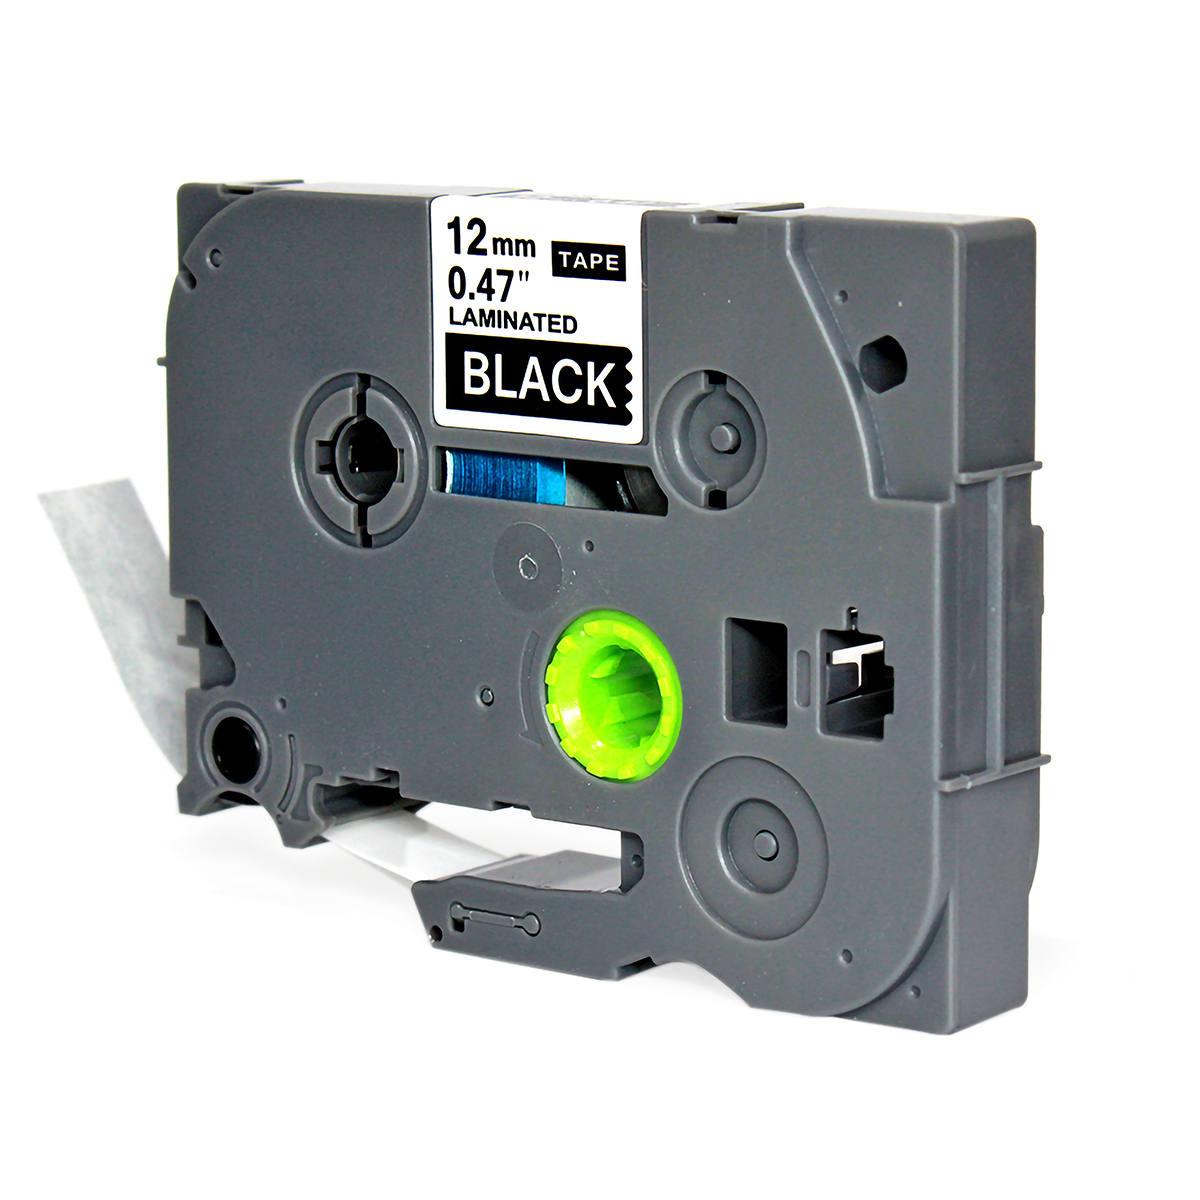 Fita Compatível para Rotulador 12mm x 8m Preto/Branco Marca X-Full Referência TZc-335 TZe-335 TZ-335 para Brother